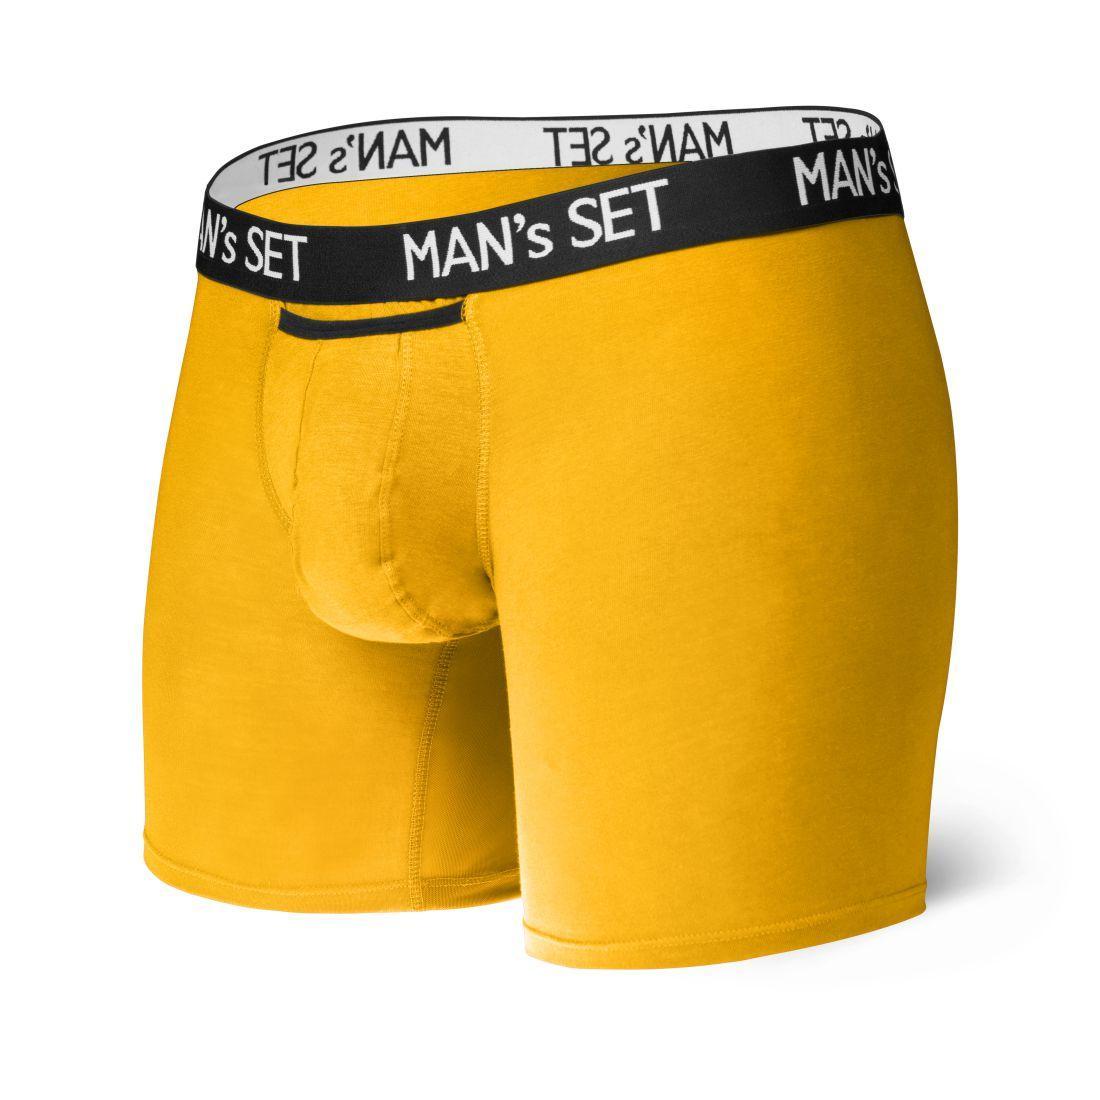 Анатомические боксеры из хлопка Long, желтый